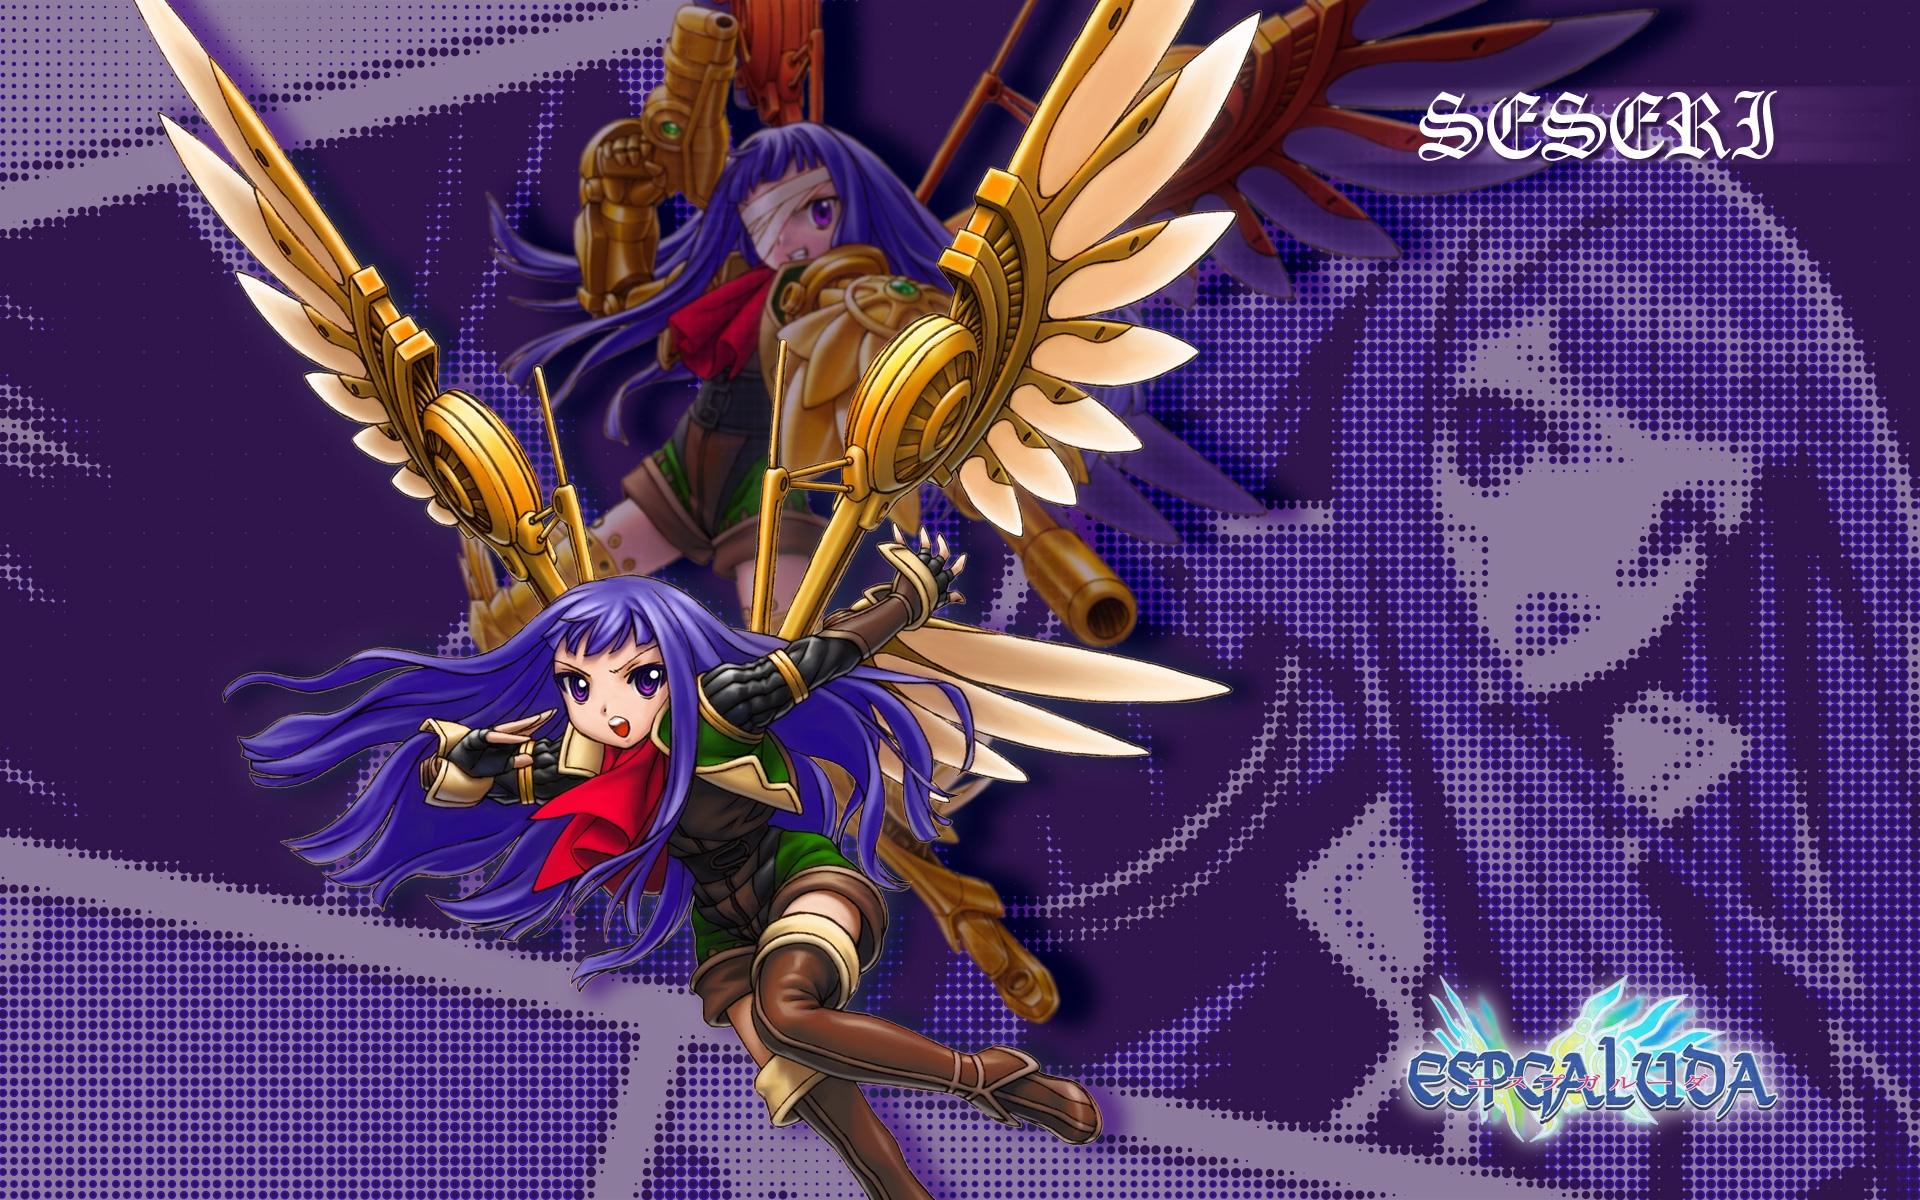 Anime blue hair wings purple mythology attack flight girl games screenshot graphics mecha figurine computer wallpaper